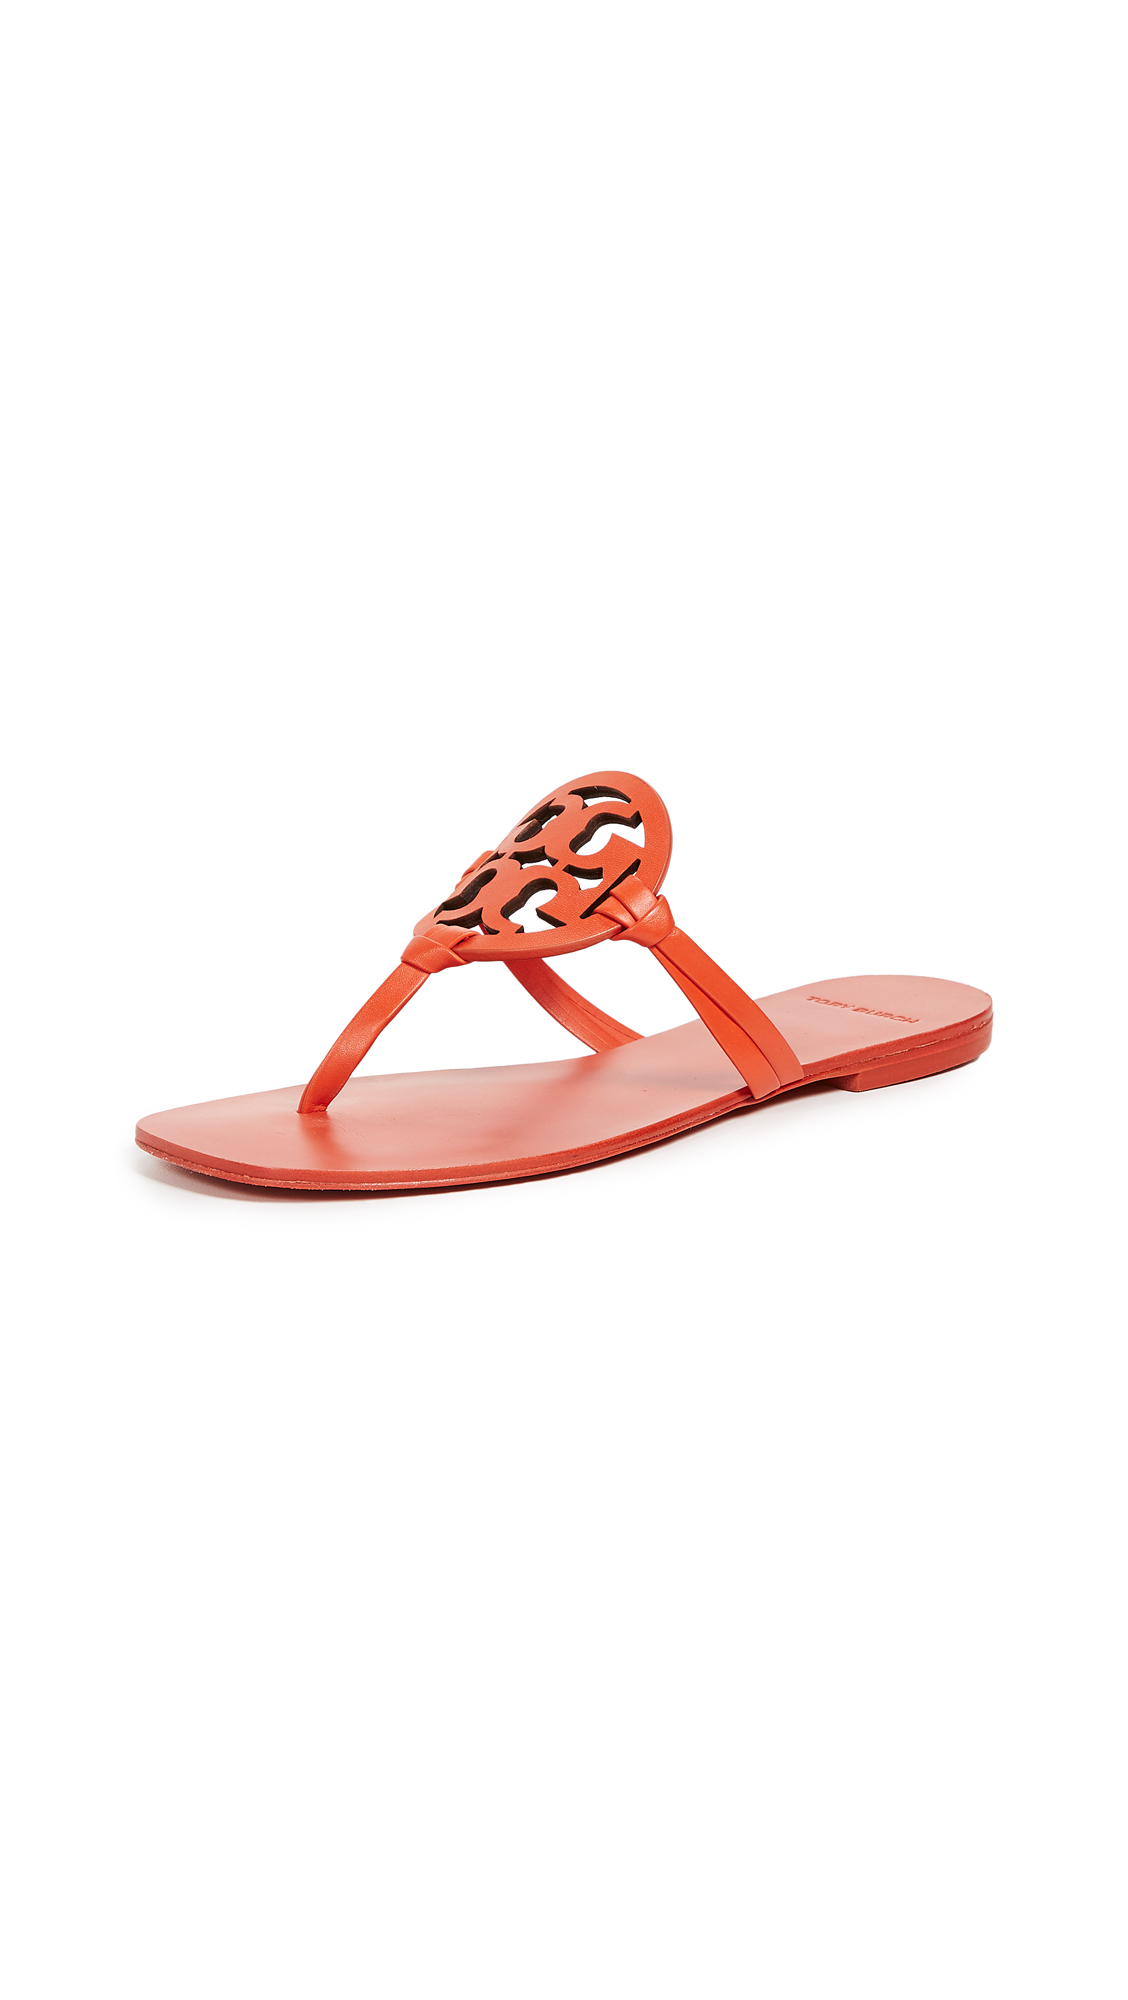 Tory Burch Square Toe Miller Flip Flops - Sweet Tangerine